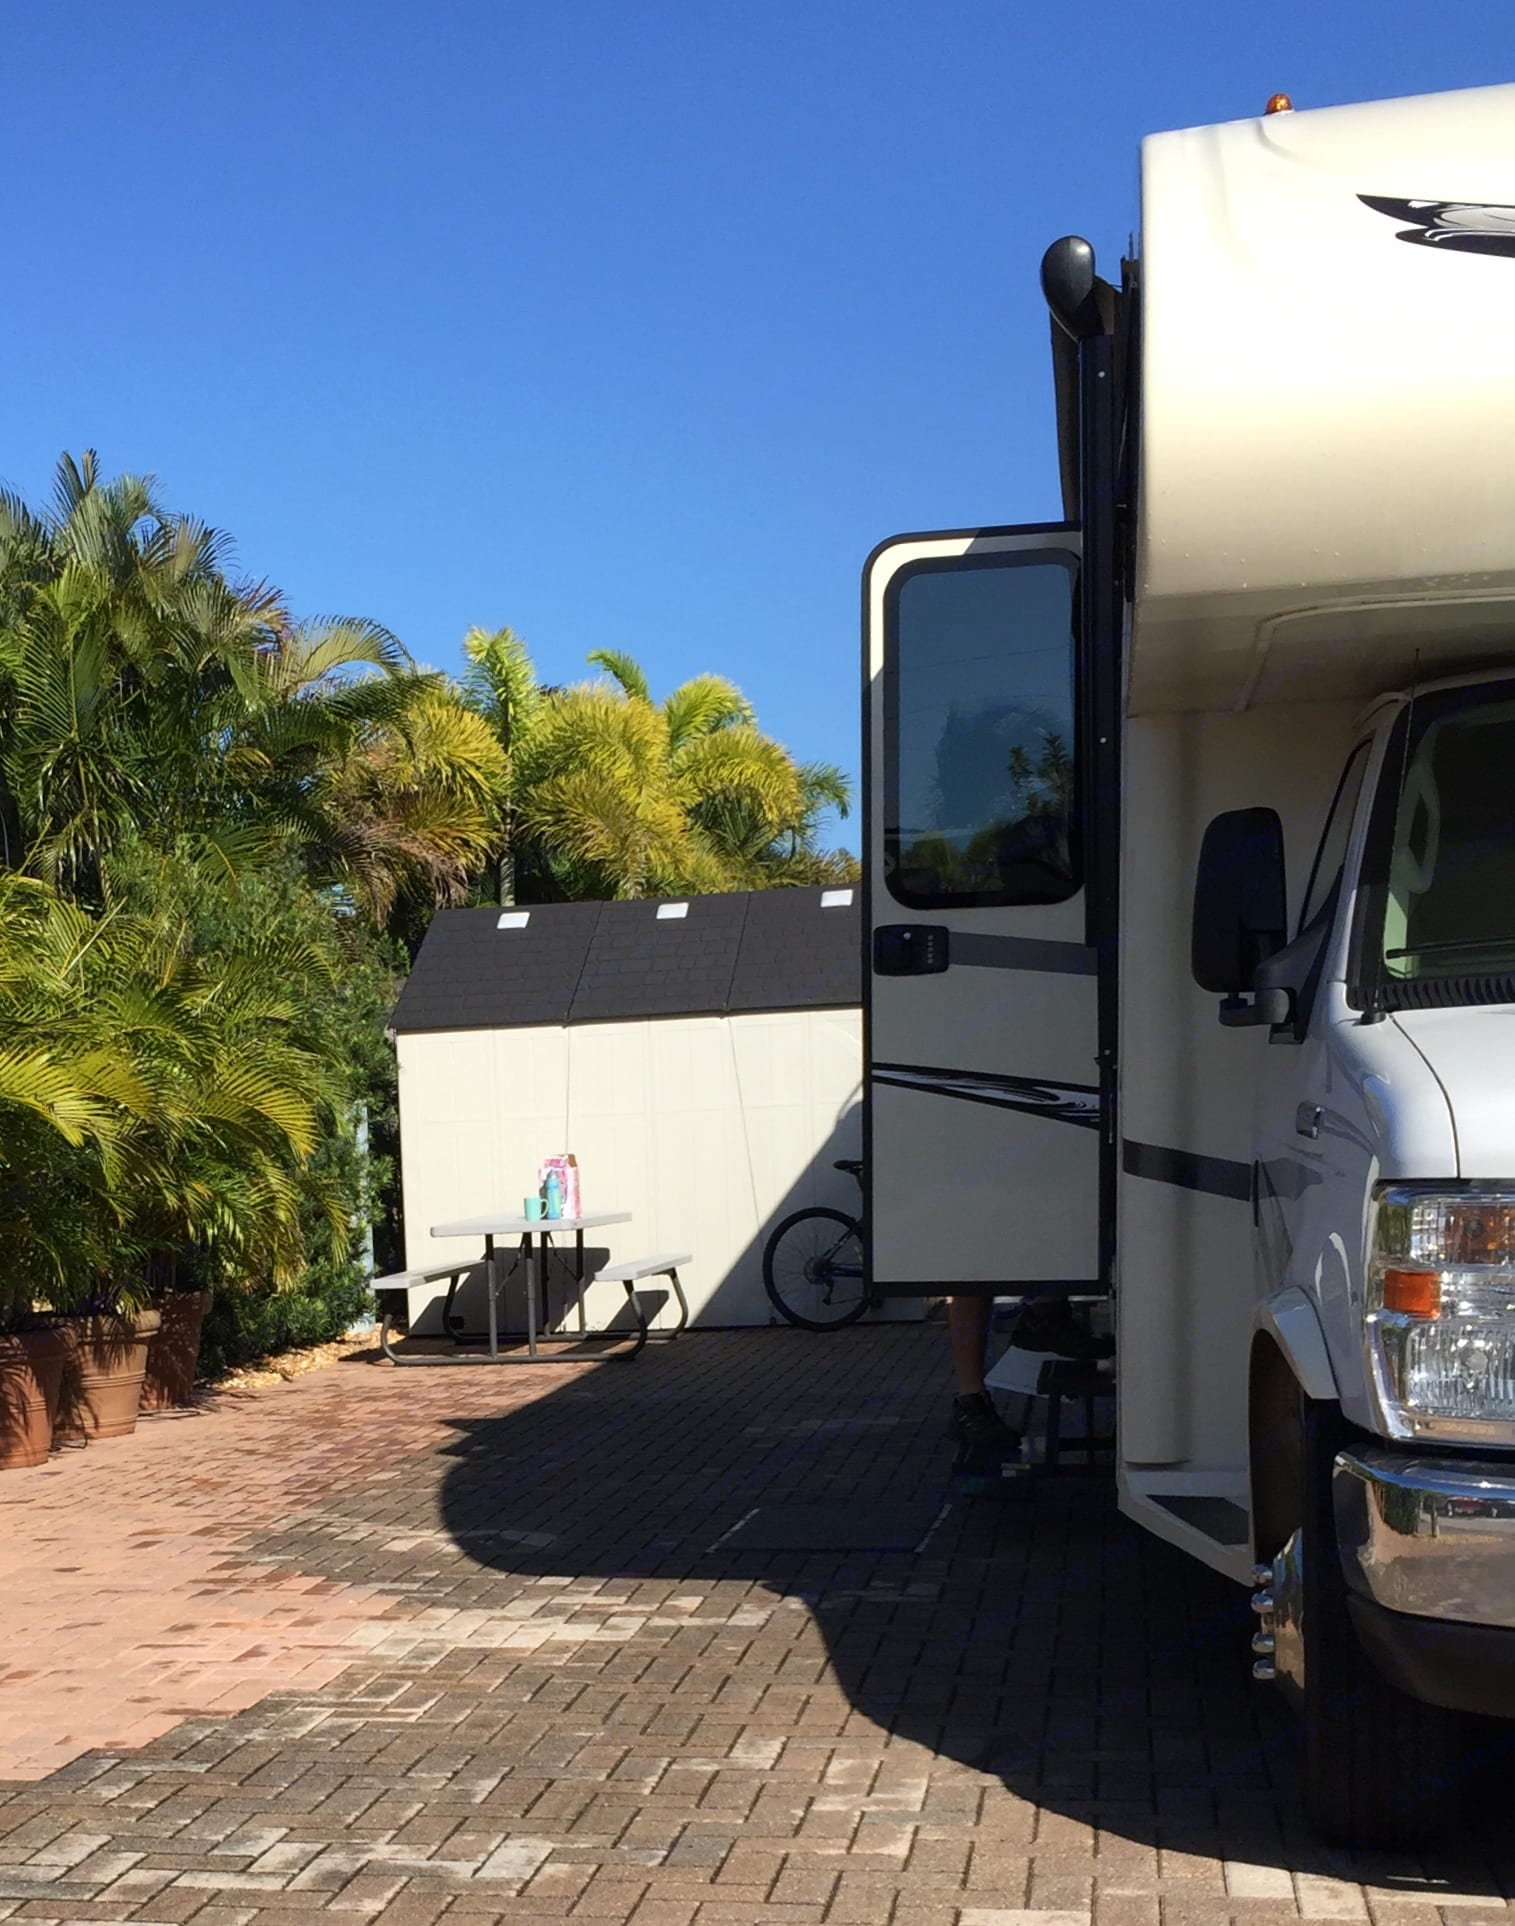 Spacious camp site in Florida. Jayco Greyhawk 2017